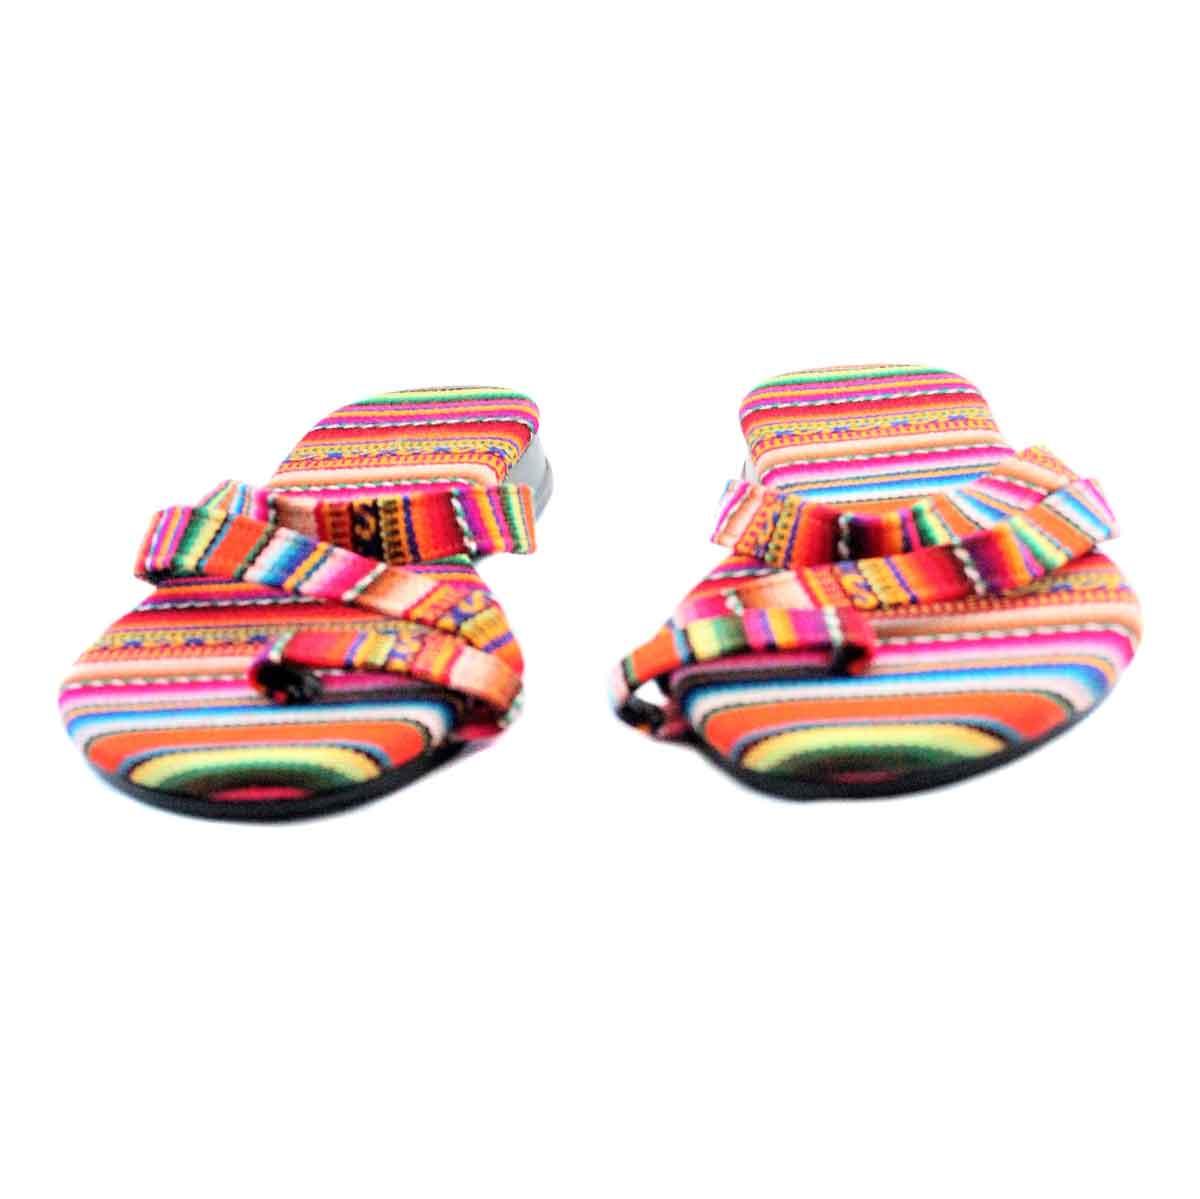 Inka-Products-Sandales Péruviennes-Orange-2